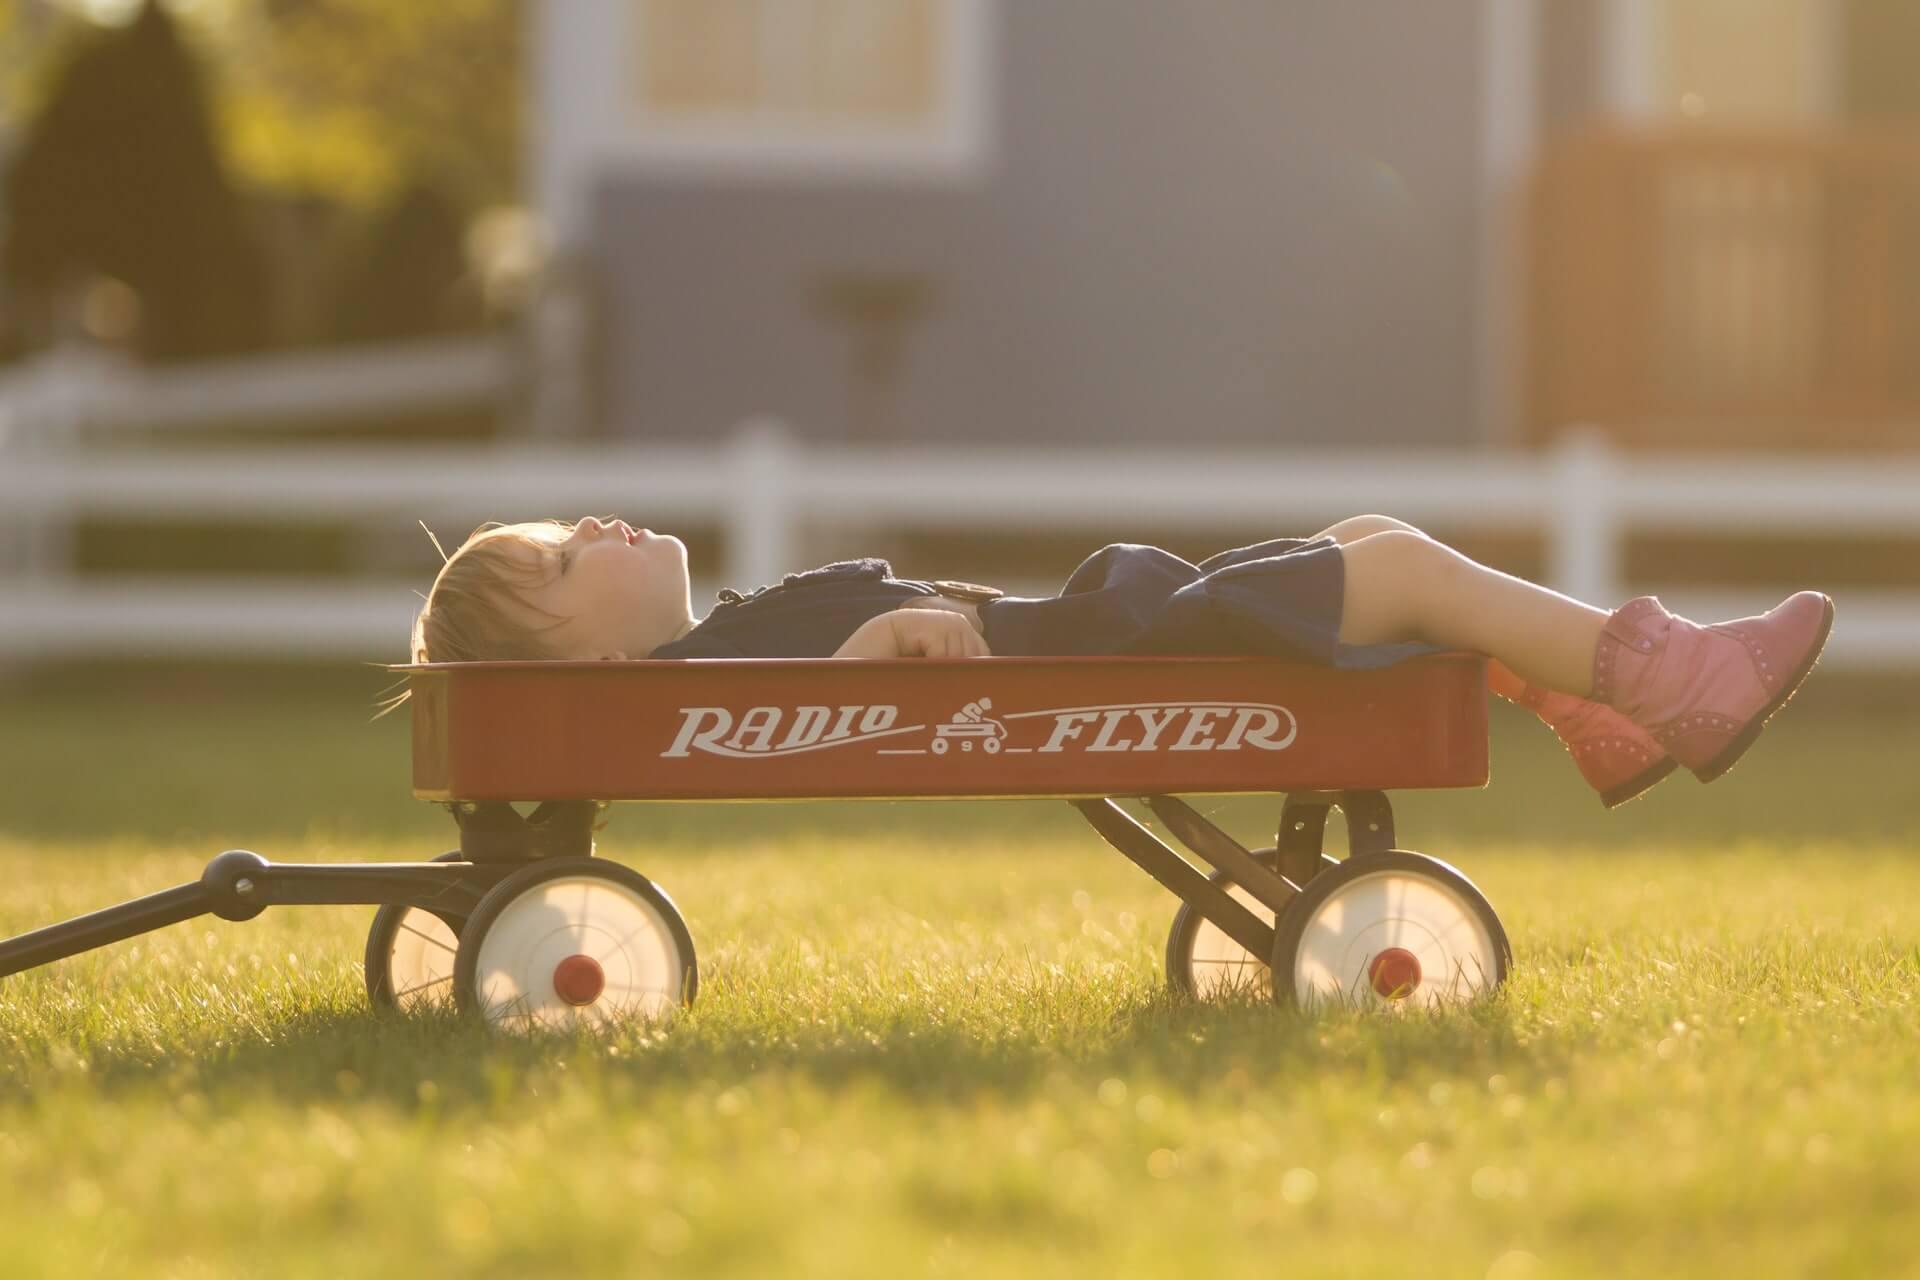 Babyschalen Top 5 in 2021 - Ratgeber Papammunity - Header Grafik